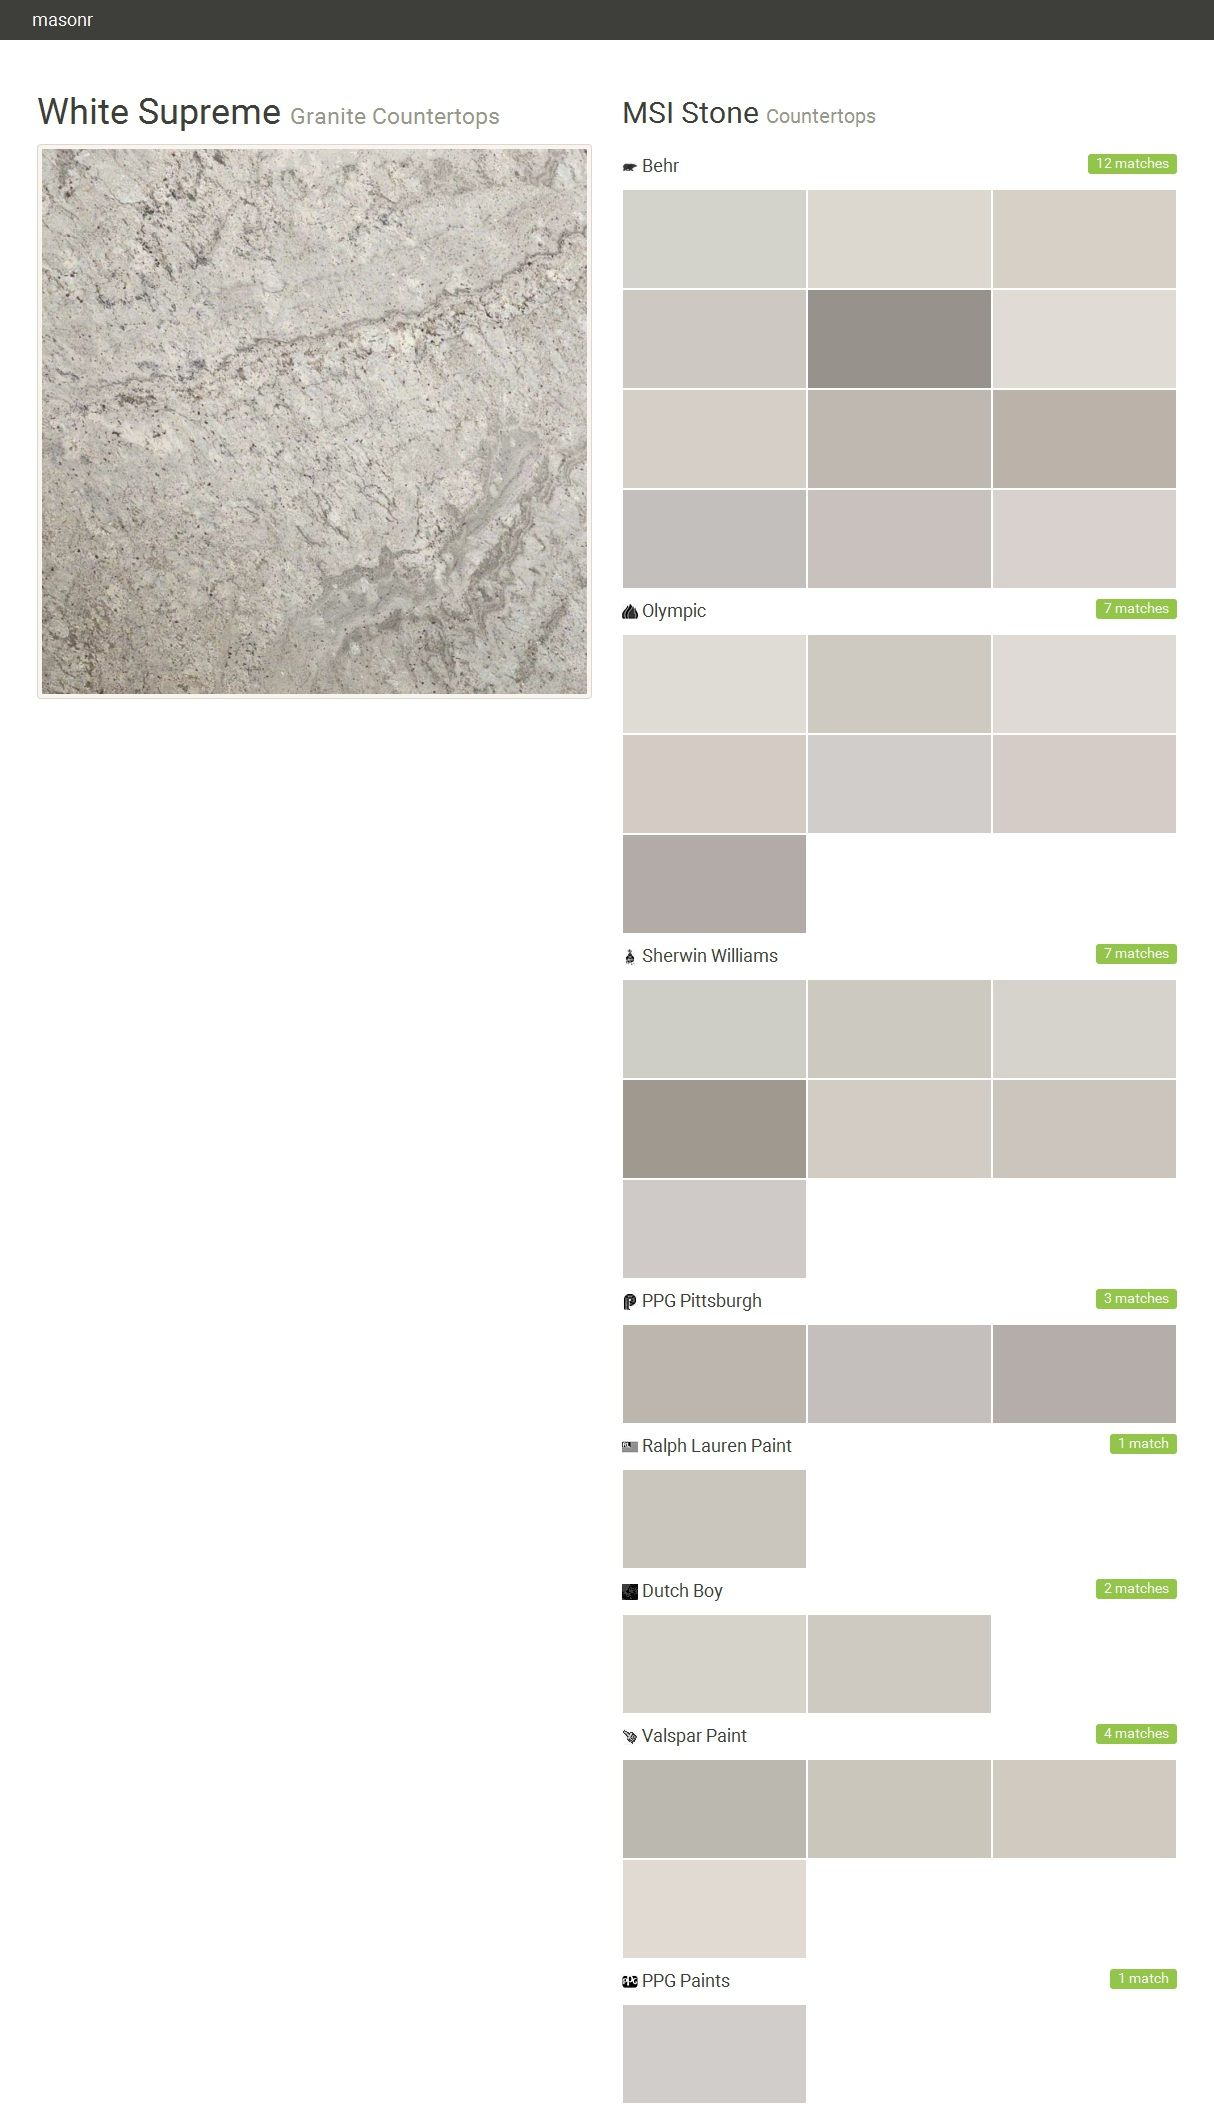 White Supreme. Granite Countertops. Countertops. MSI Stone. Behr. Olympic.  Sherwin